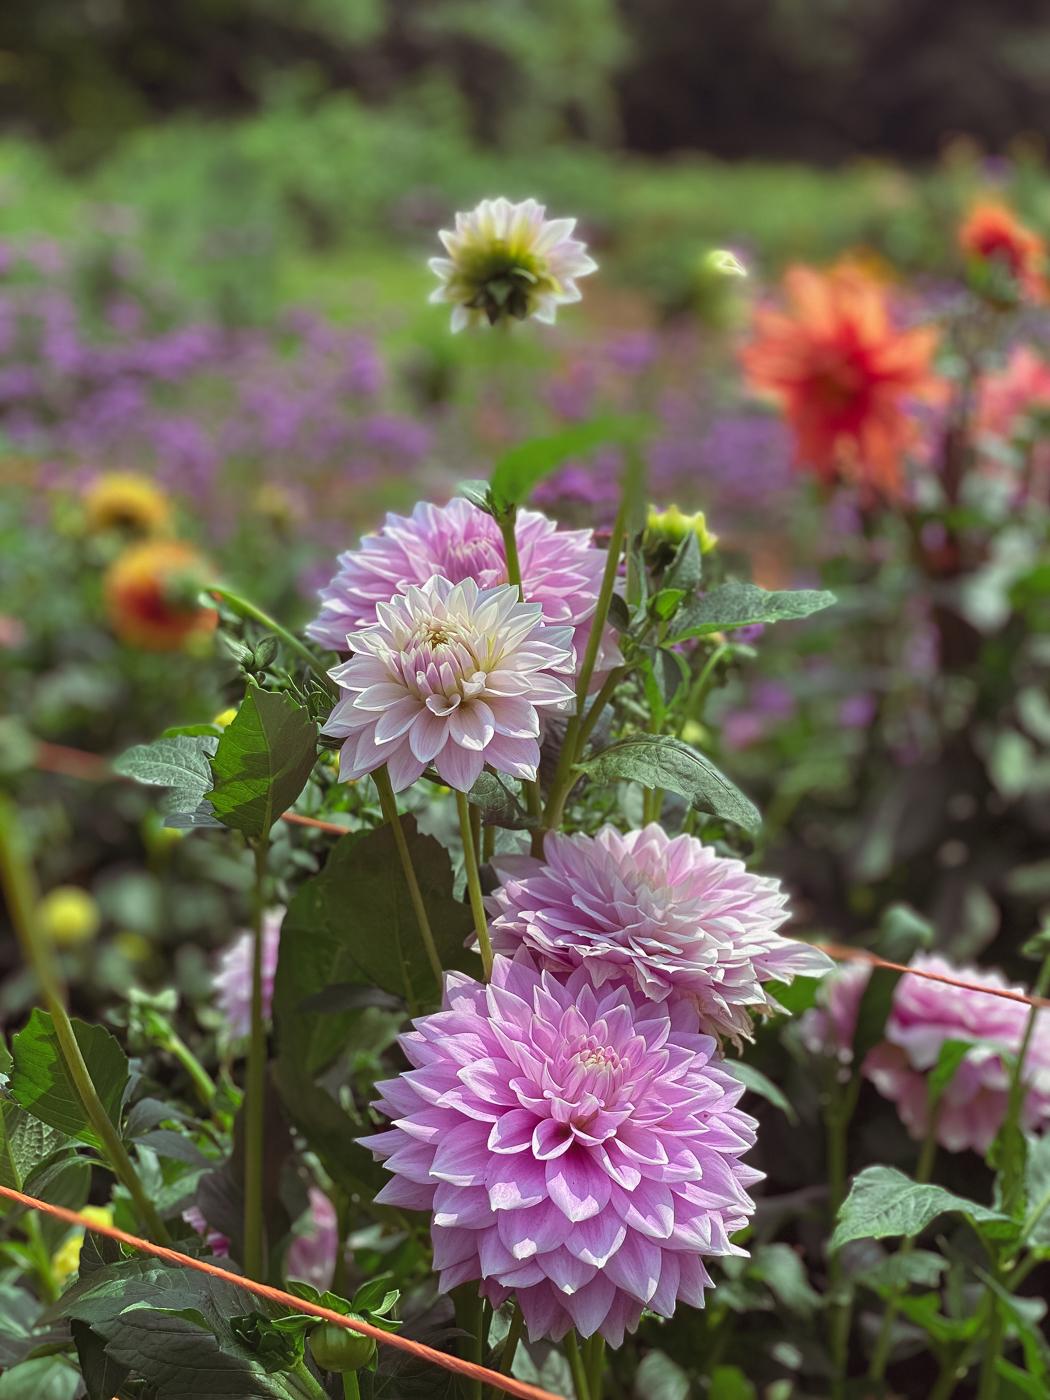 dahlia, summer garden flowers, blooming flowers, summer flowers that bloom